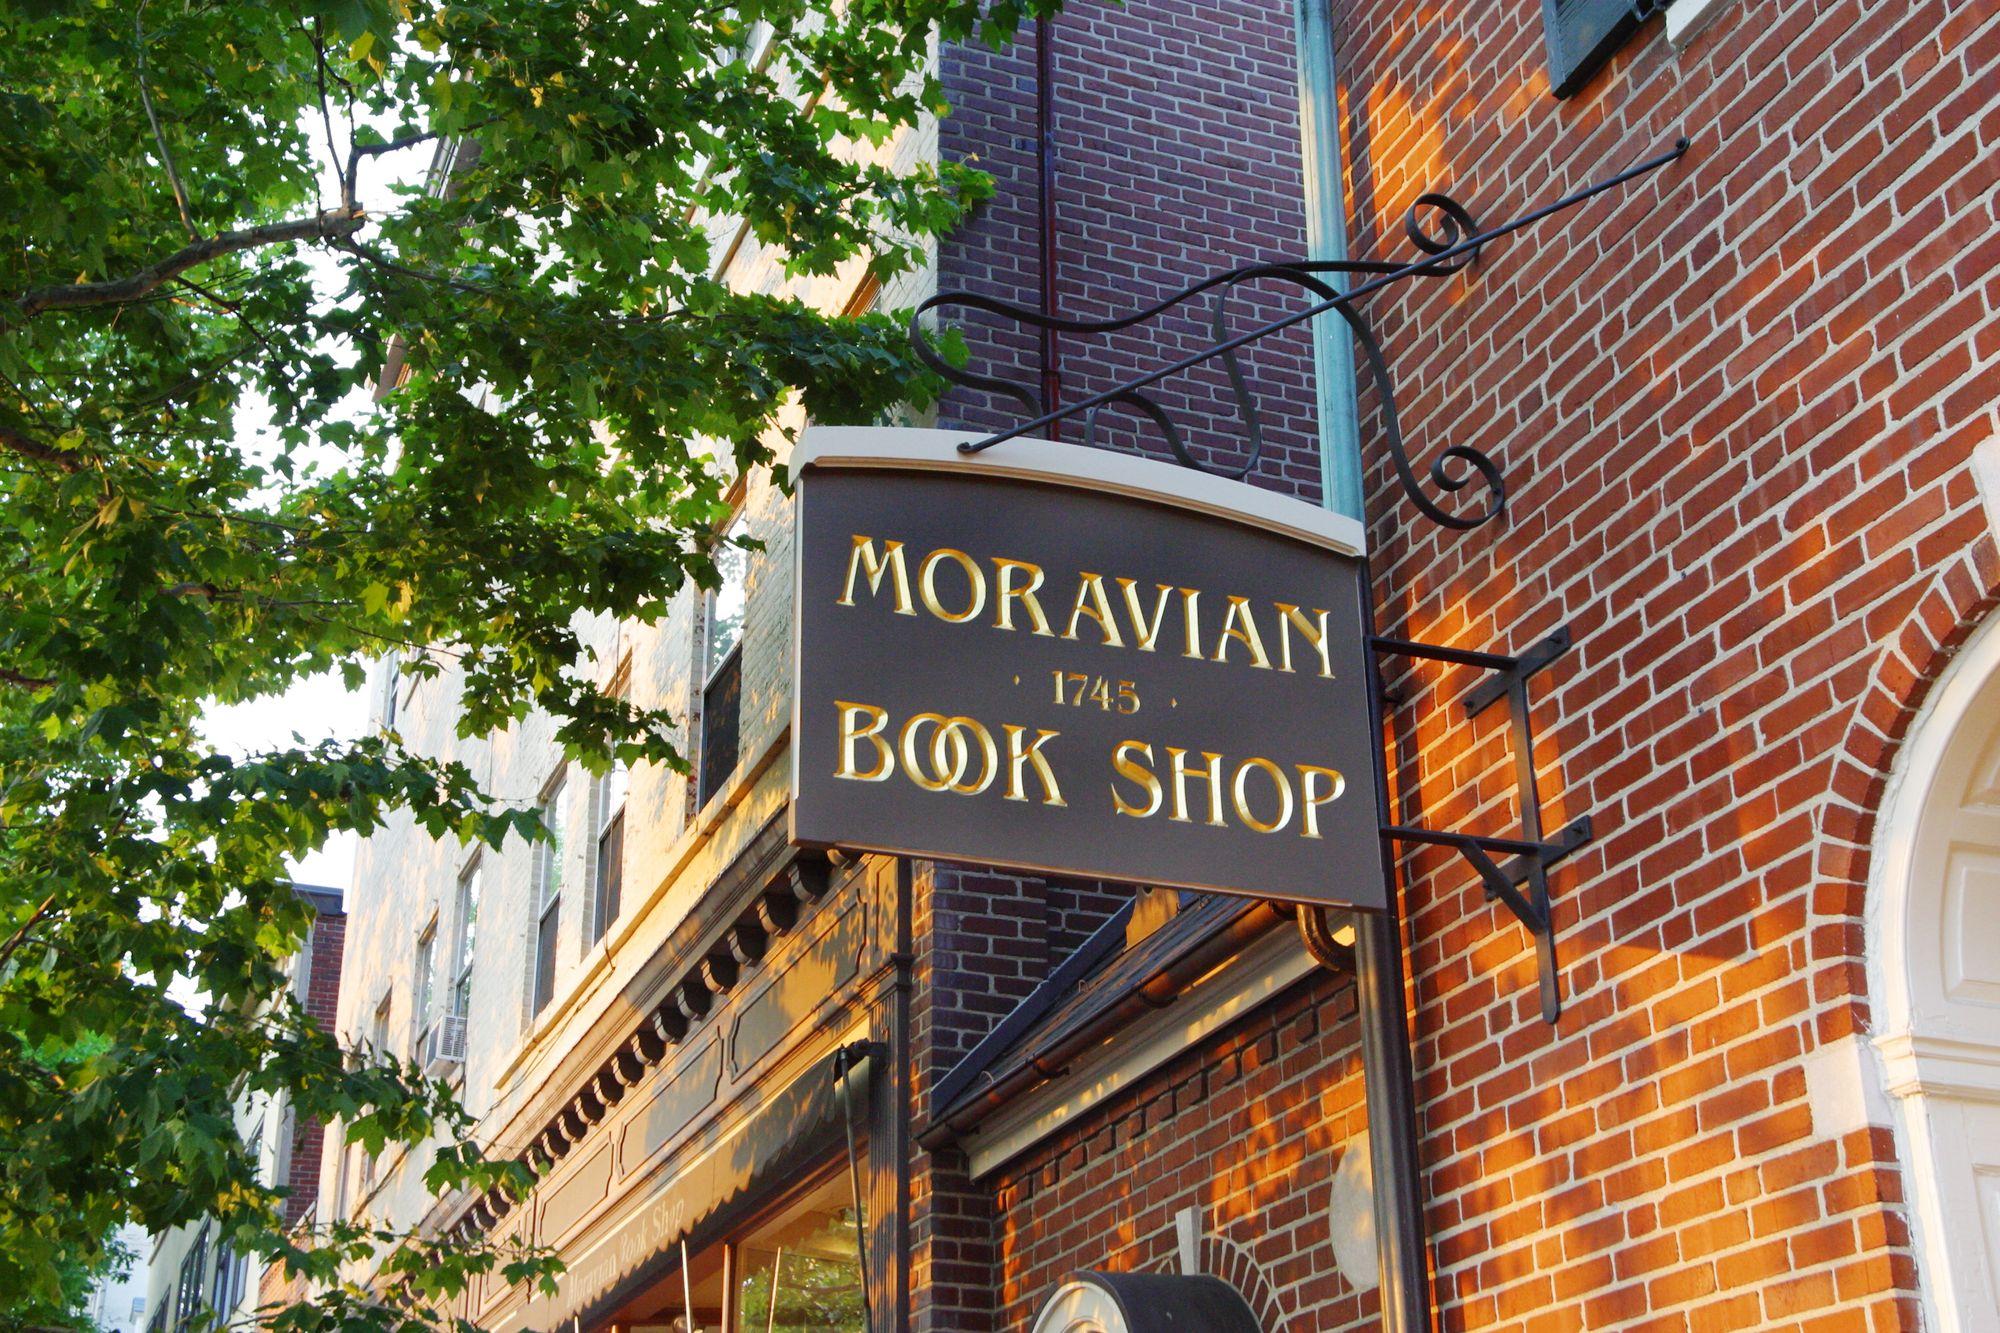 Moravian Book Shop in Bethlehem, PA